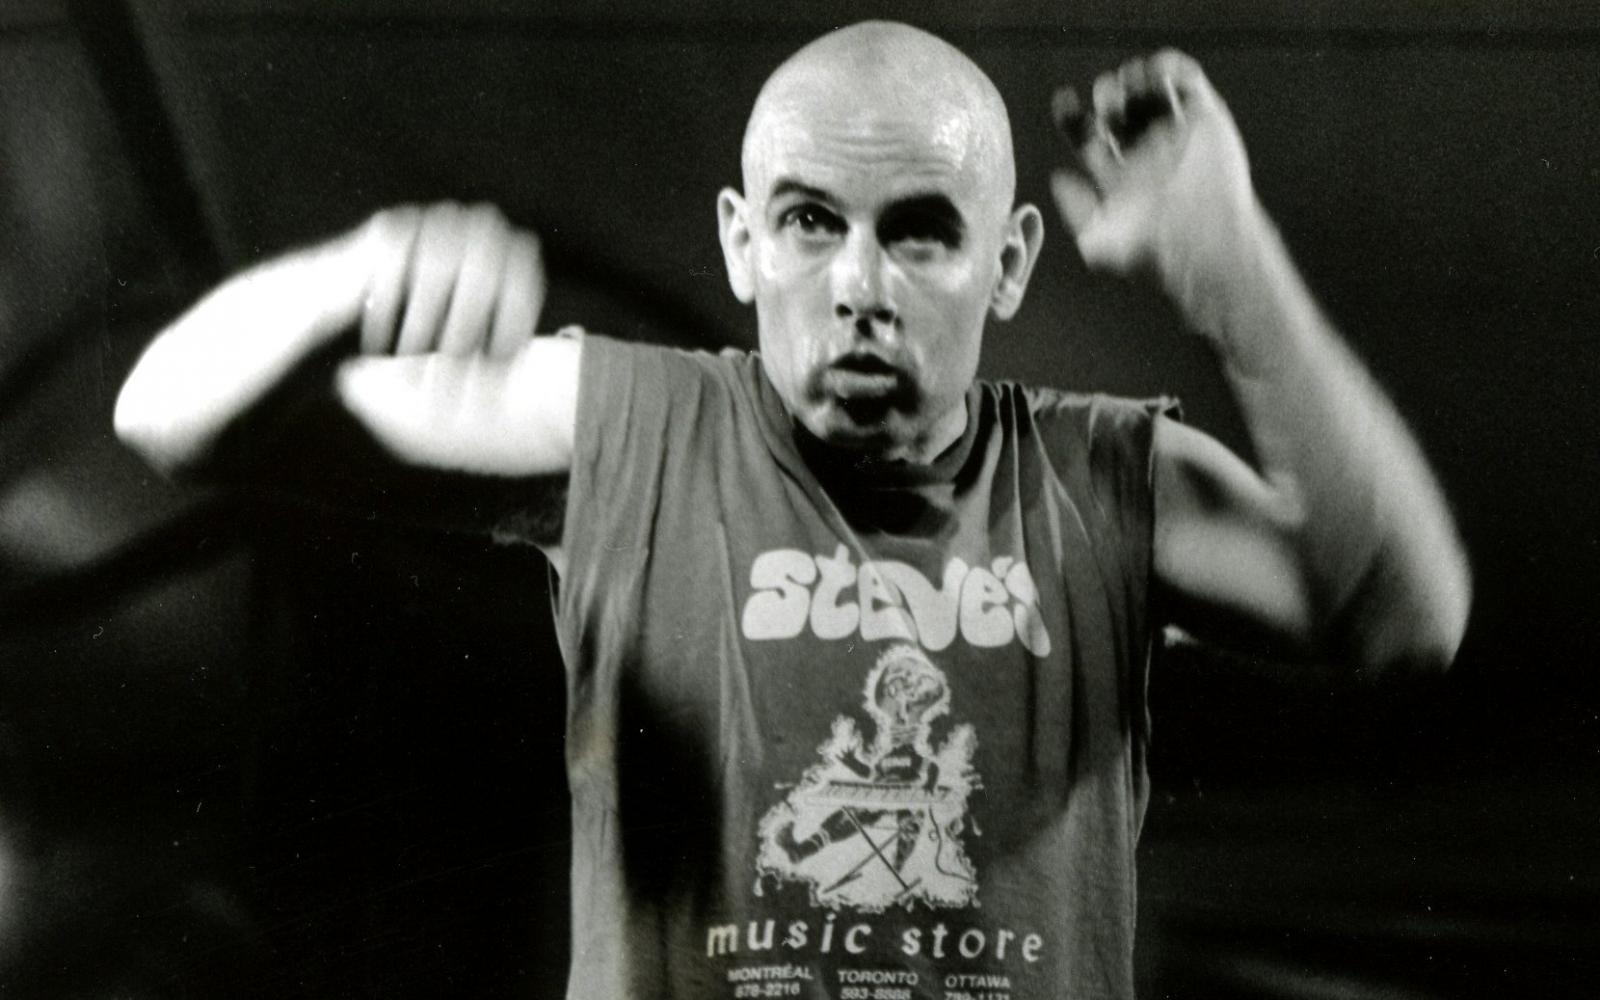 Festiwal_MzM-2000-Steve_Buchanan-fot_A_Łoboda-004a.jpg